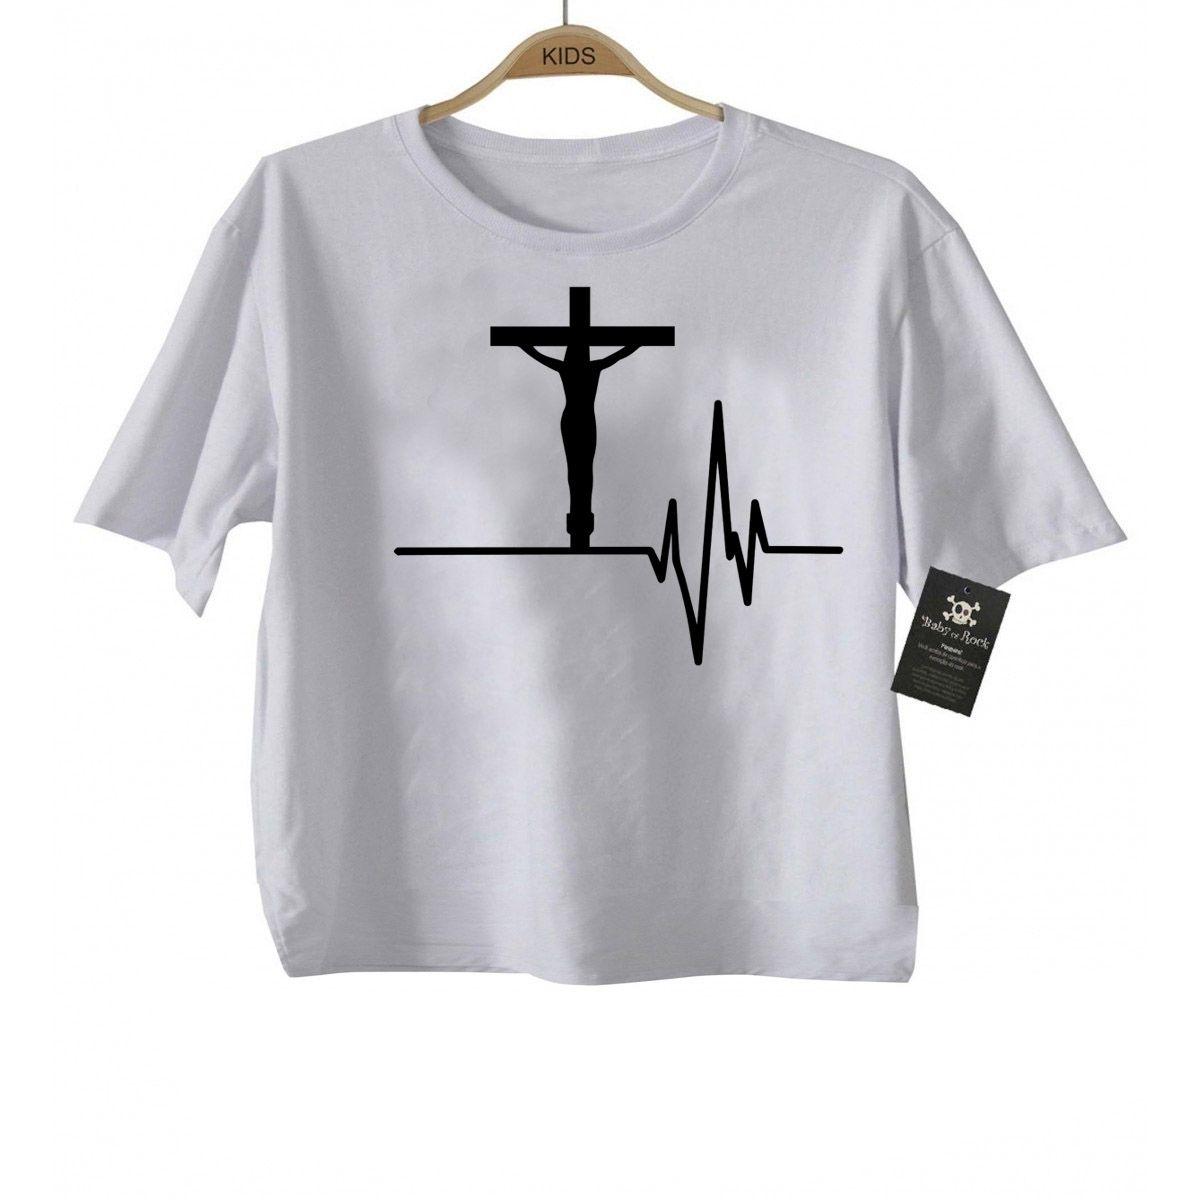 Camiseta Infantil Cristã Jesus Eletro  - White -  - Baby Monster S/A